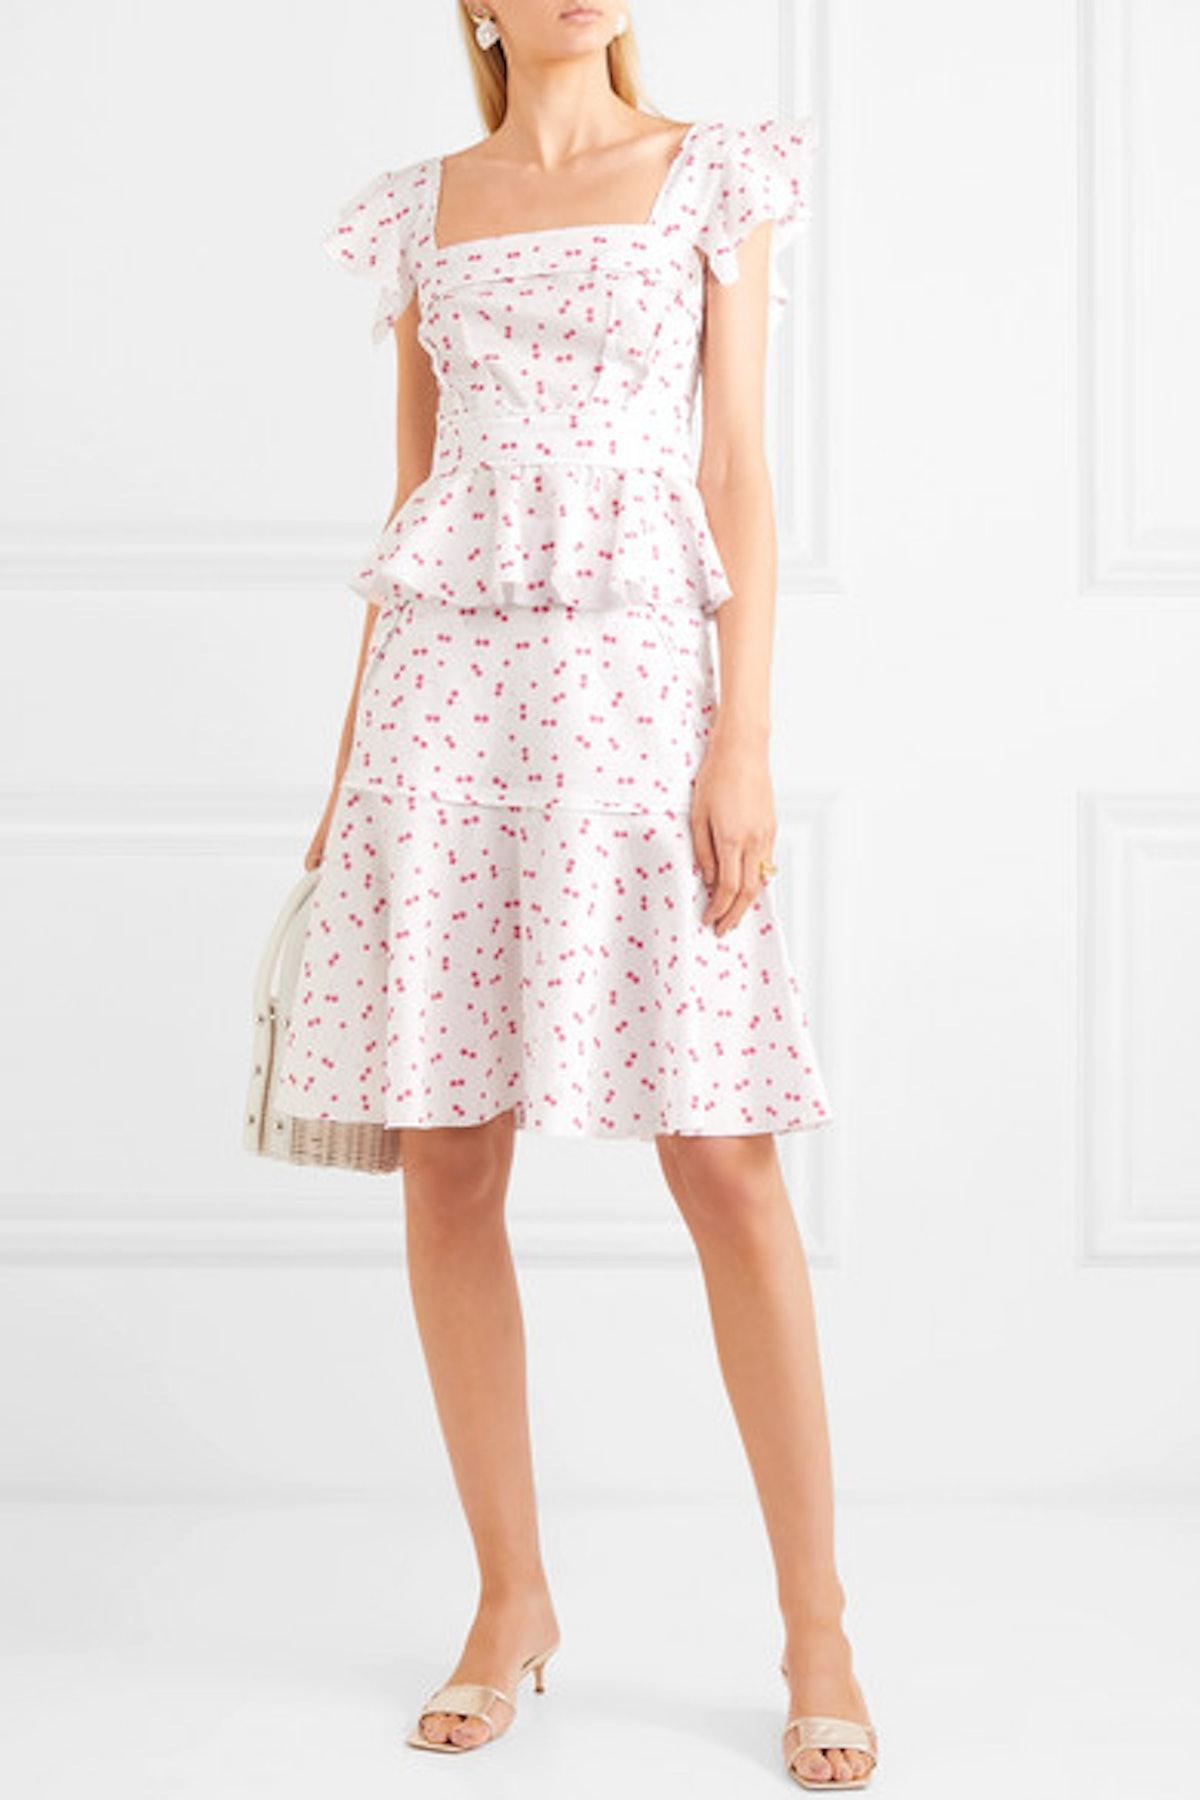 Ingrid Ruffled Printed Cotton Midi Dress